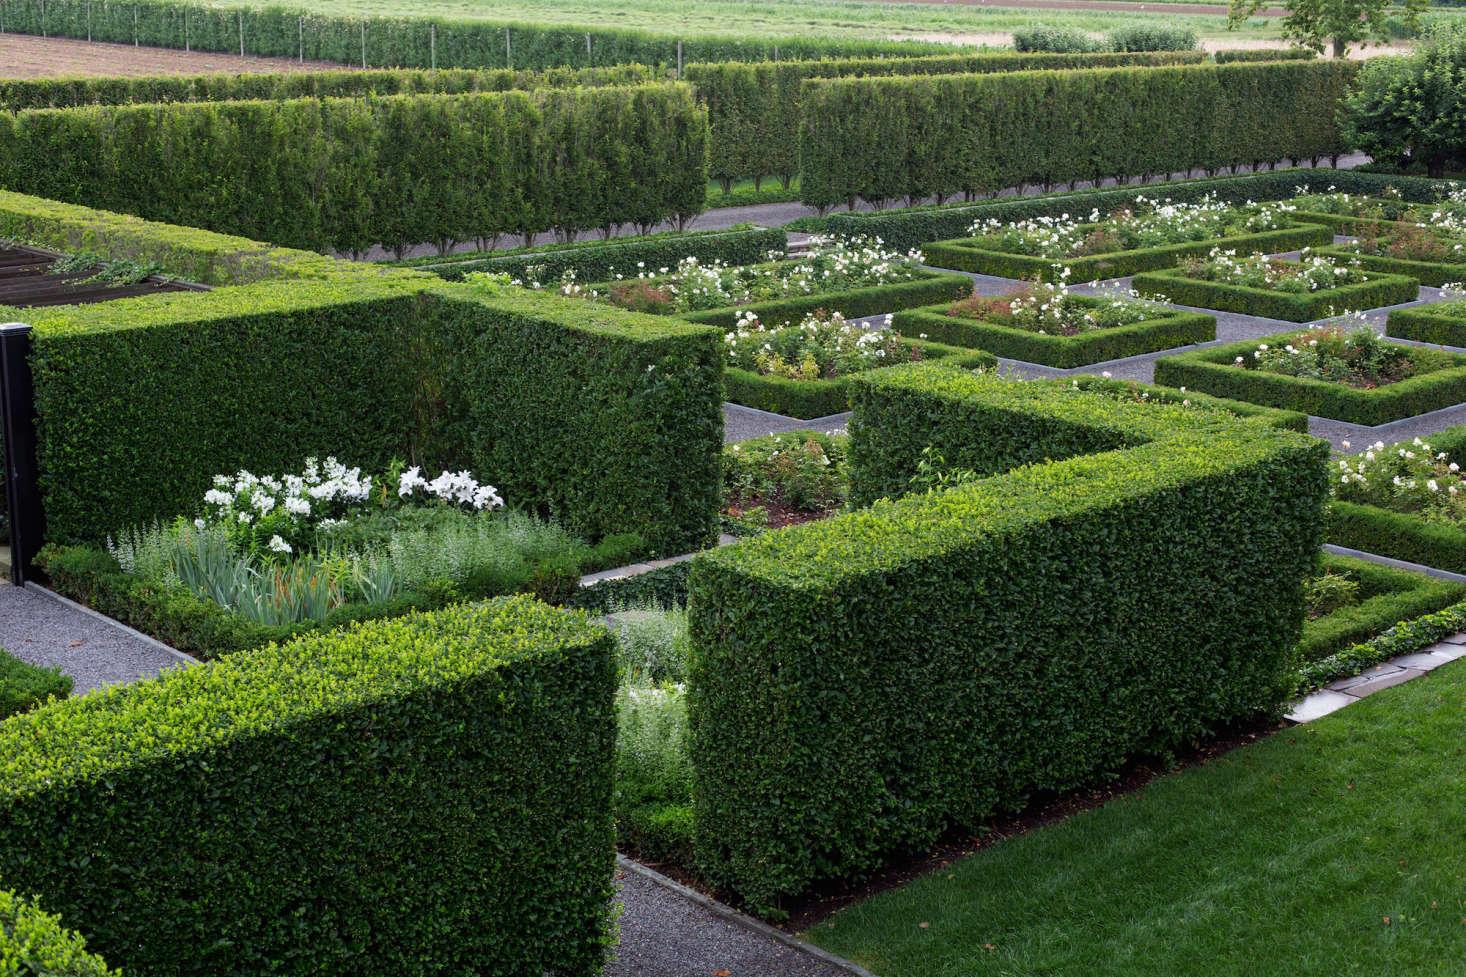 Hedges Watermill NY Garden designer Quincy Hammond